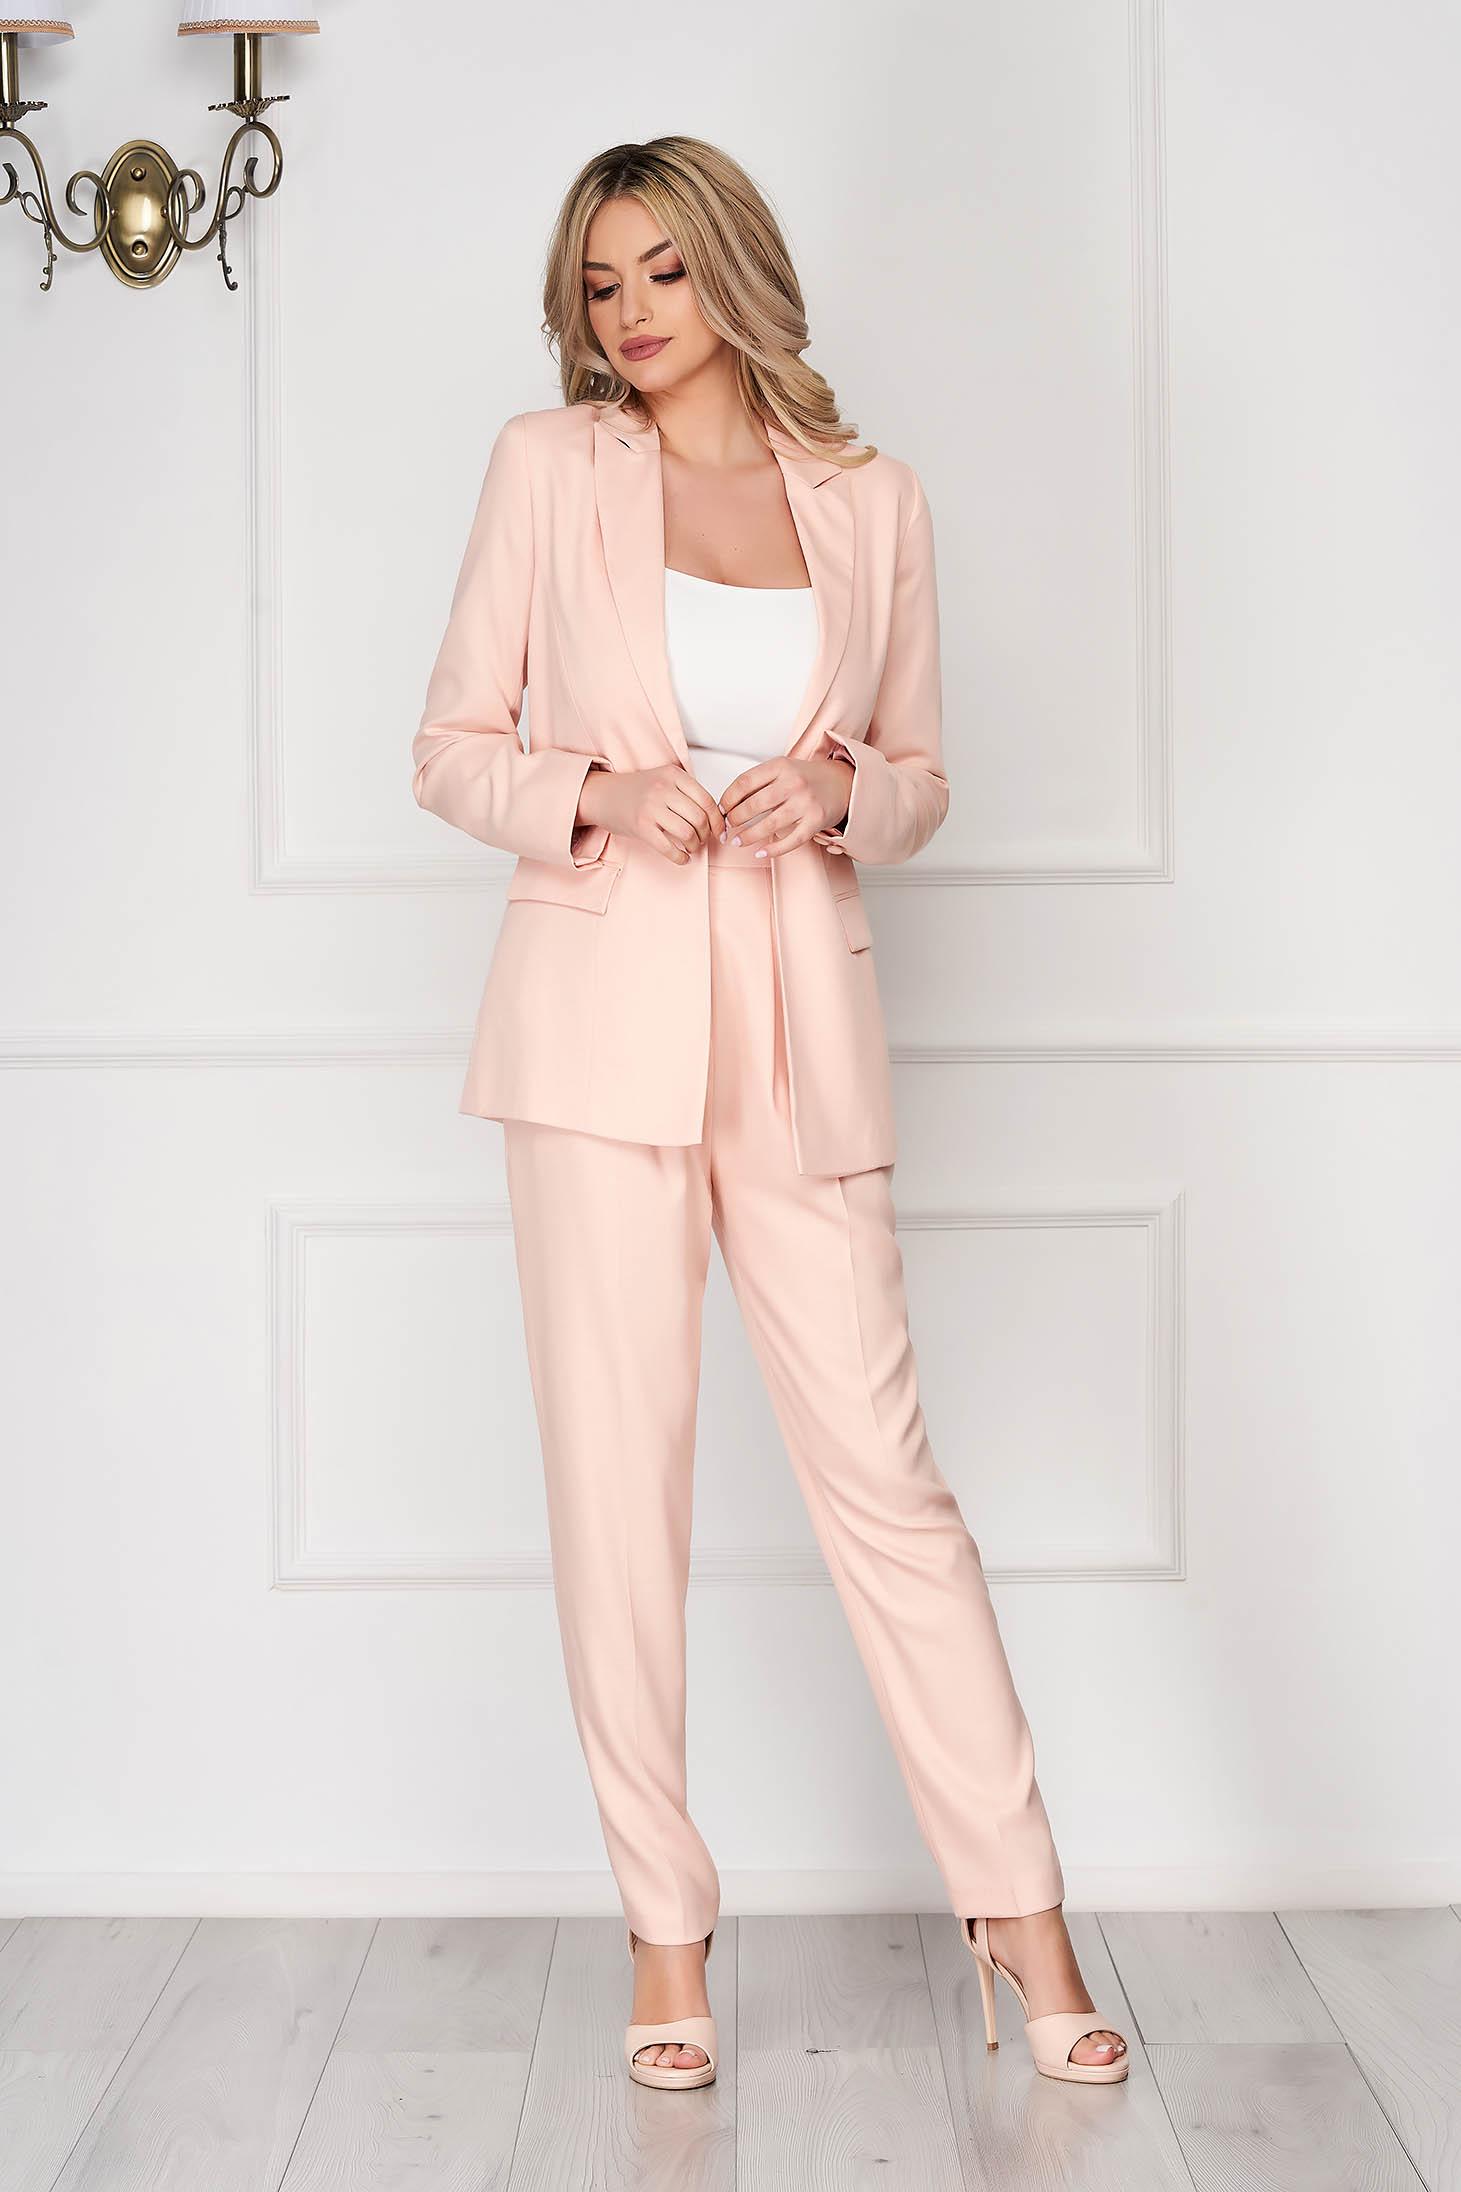 Compleu StarShinerS roz deschis office din 2 piese cu pantaloni cu buzunare si talie inalta